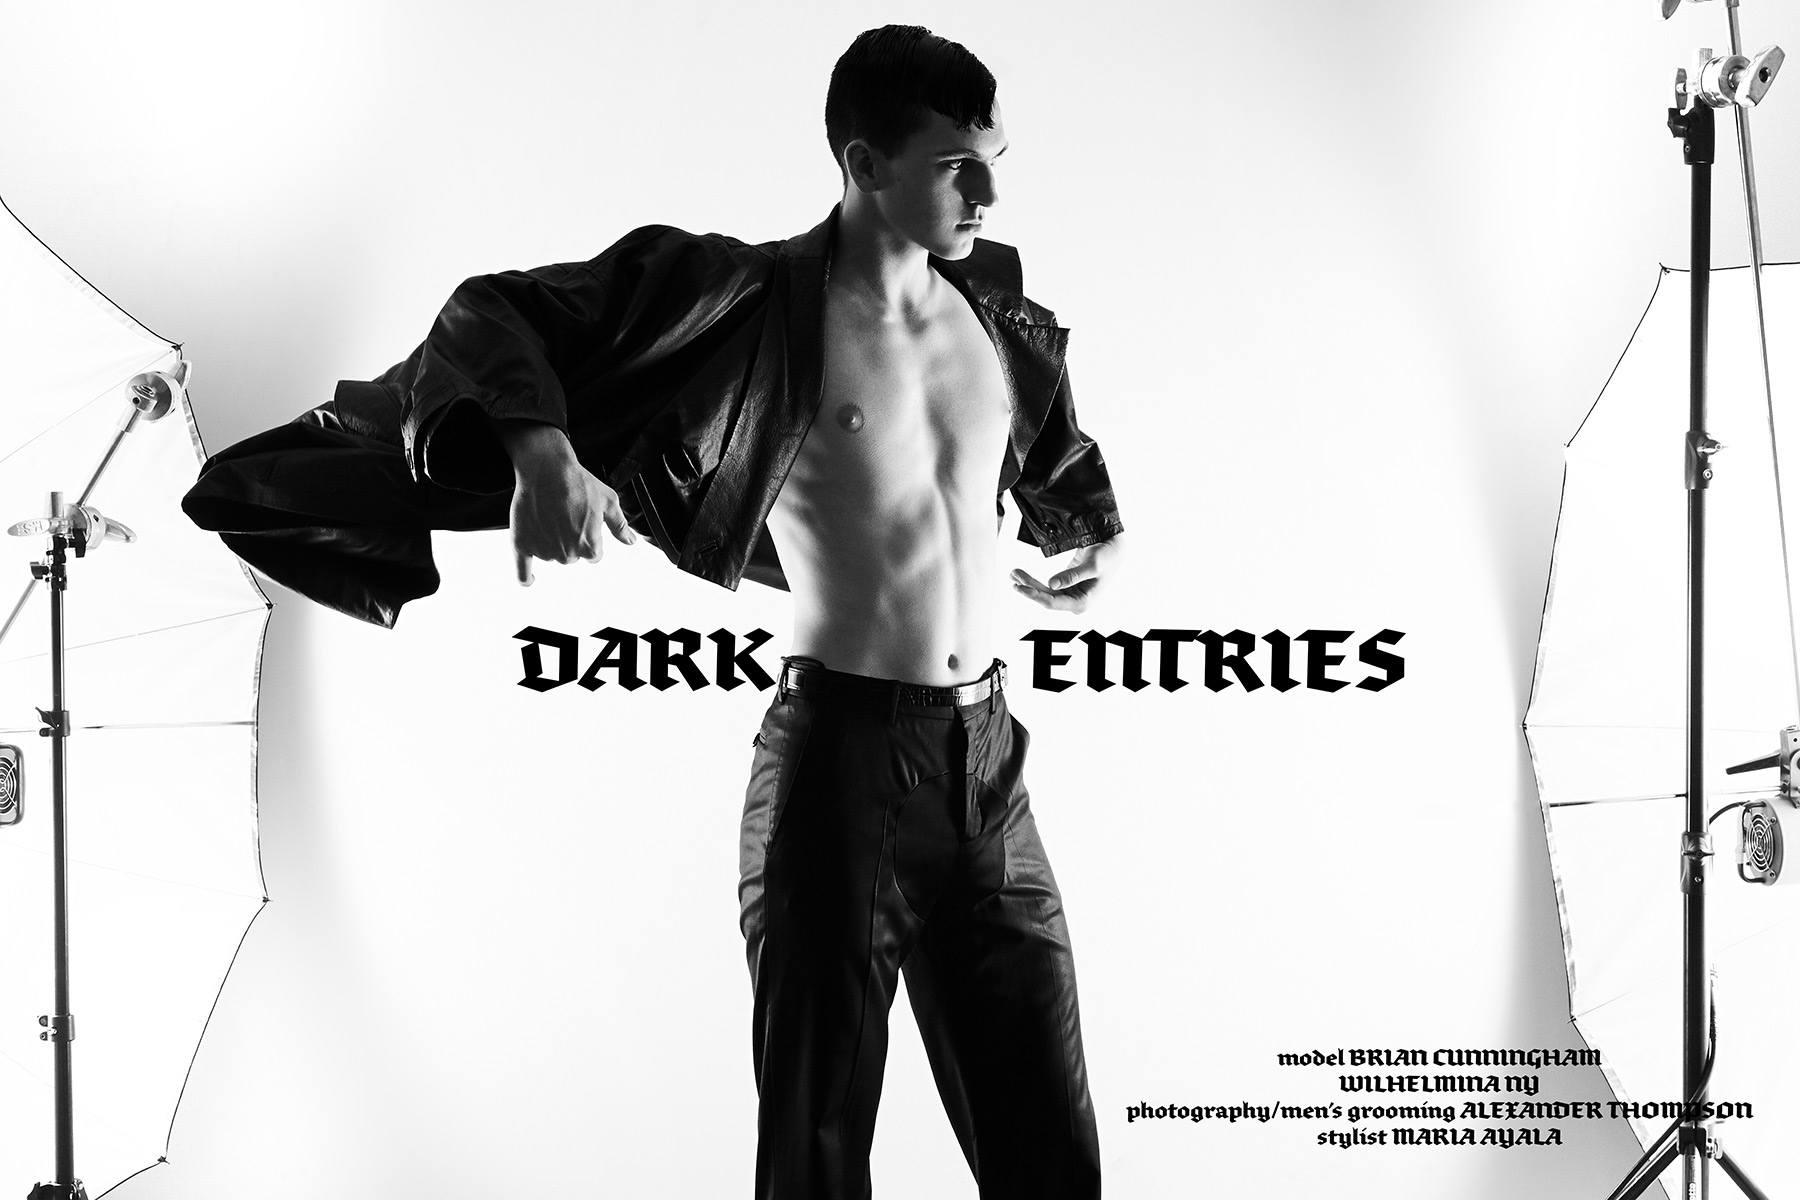 Dark Entries. Wilhelmina model Brian Cunningham photographed by Alexander Thompson for Ponyboy magazine.